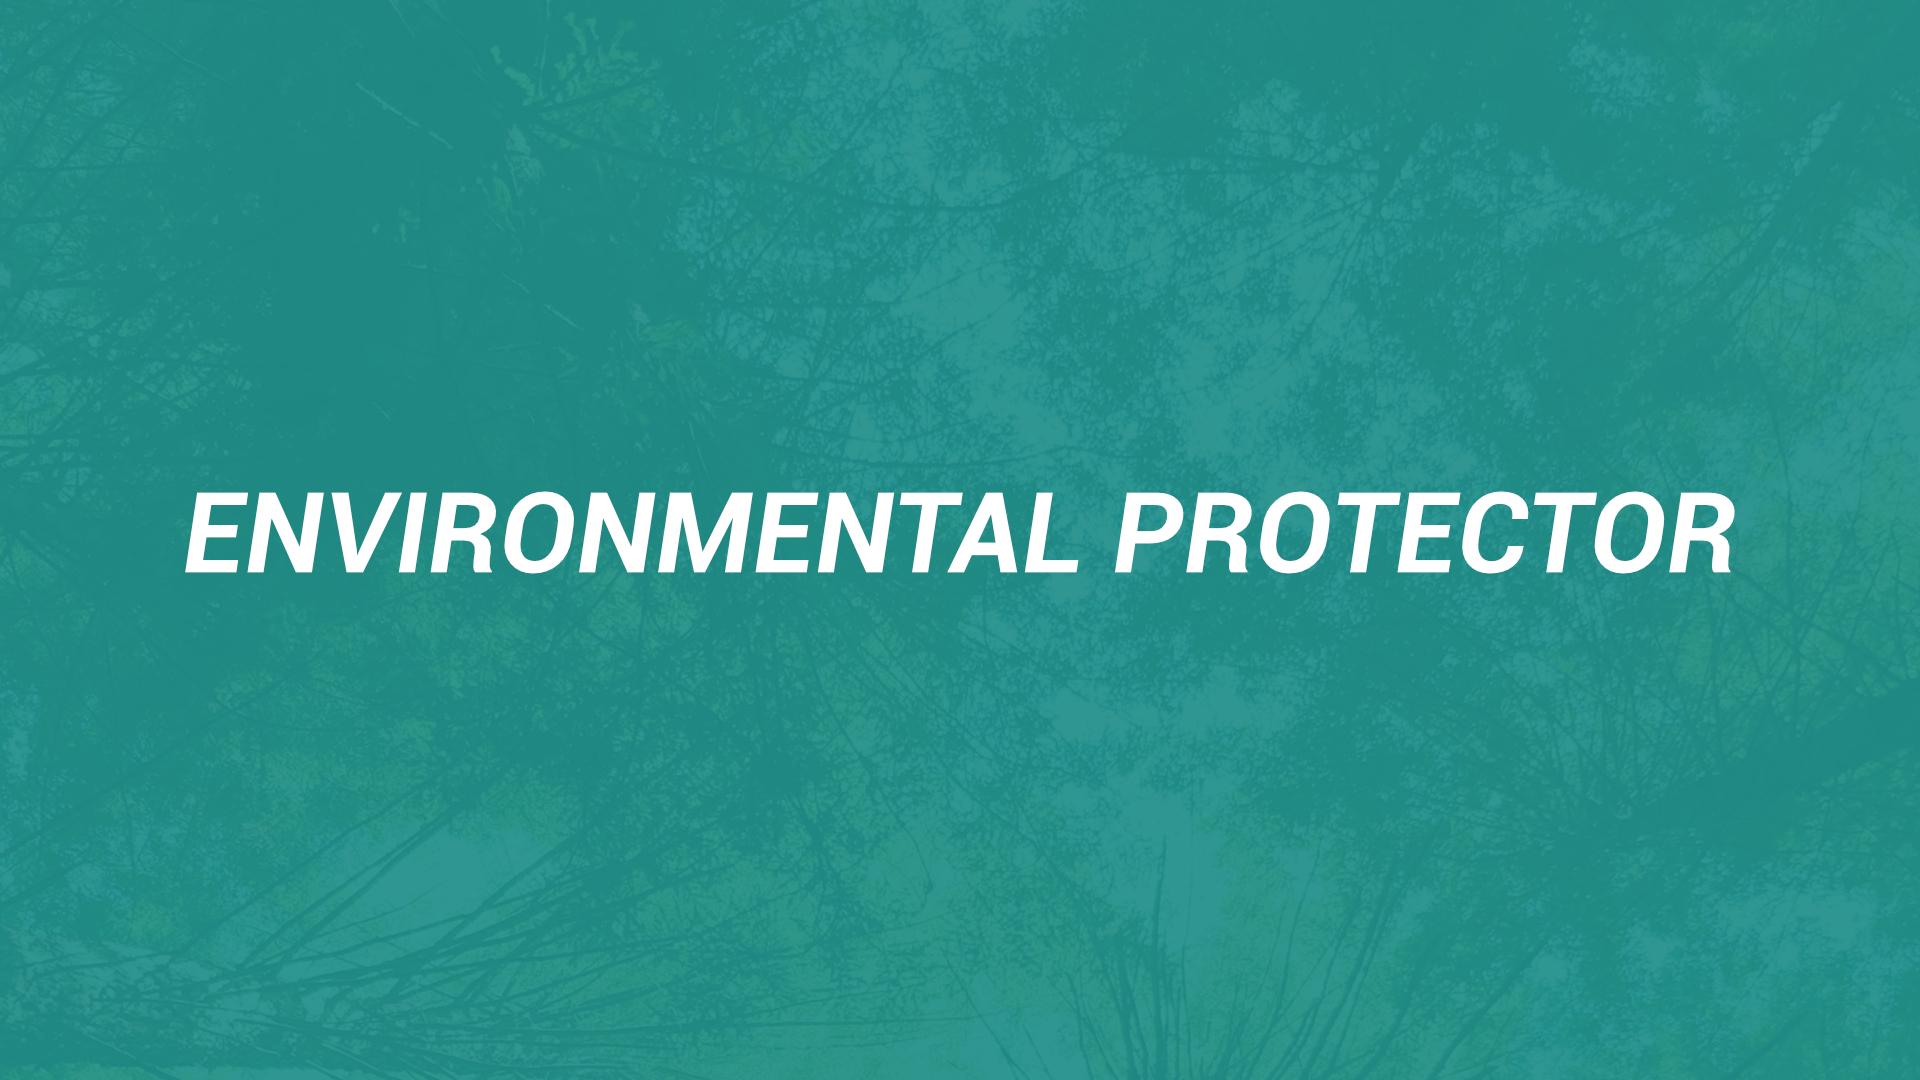 Environmental Protector.jpg